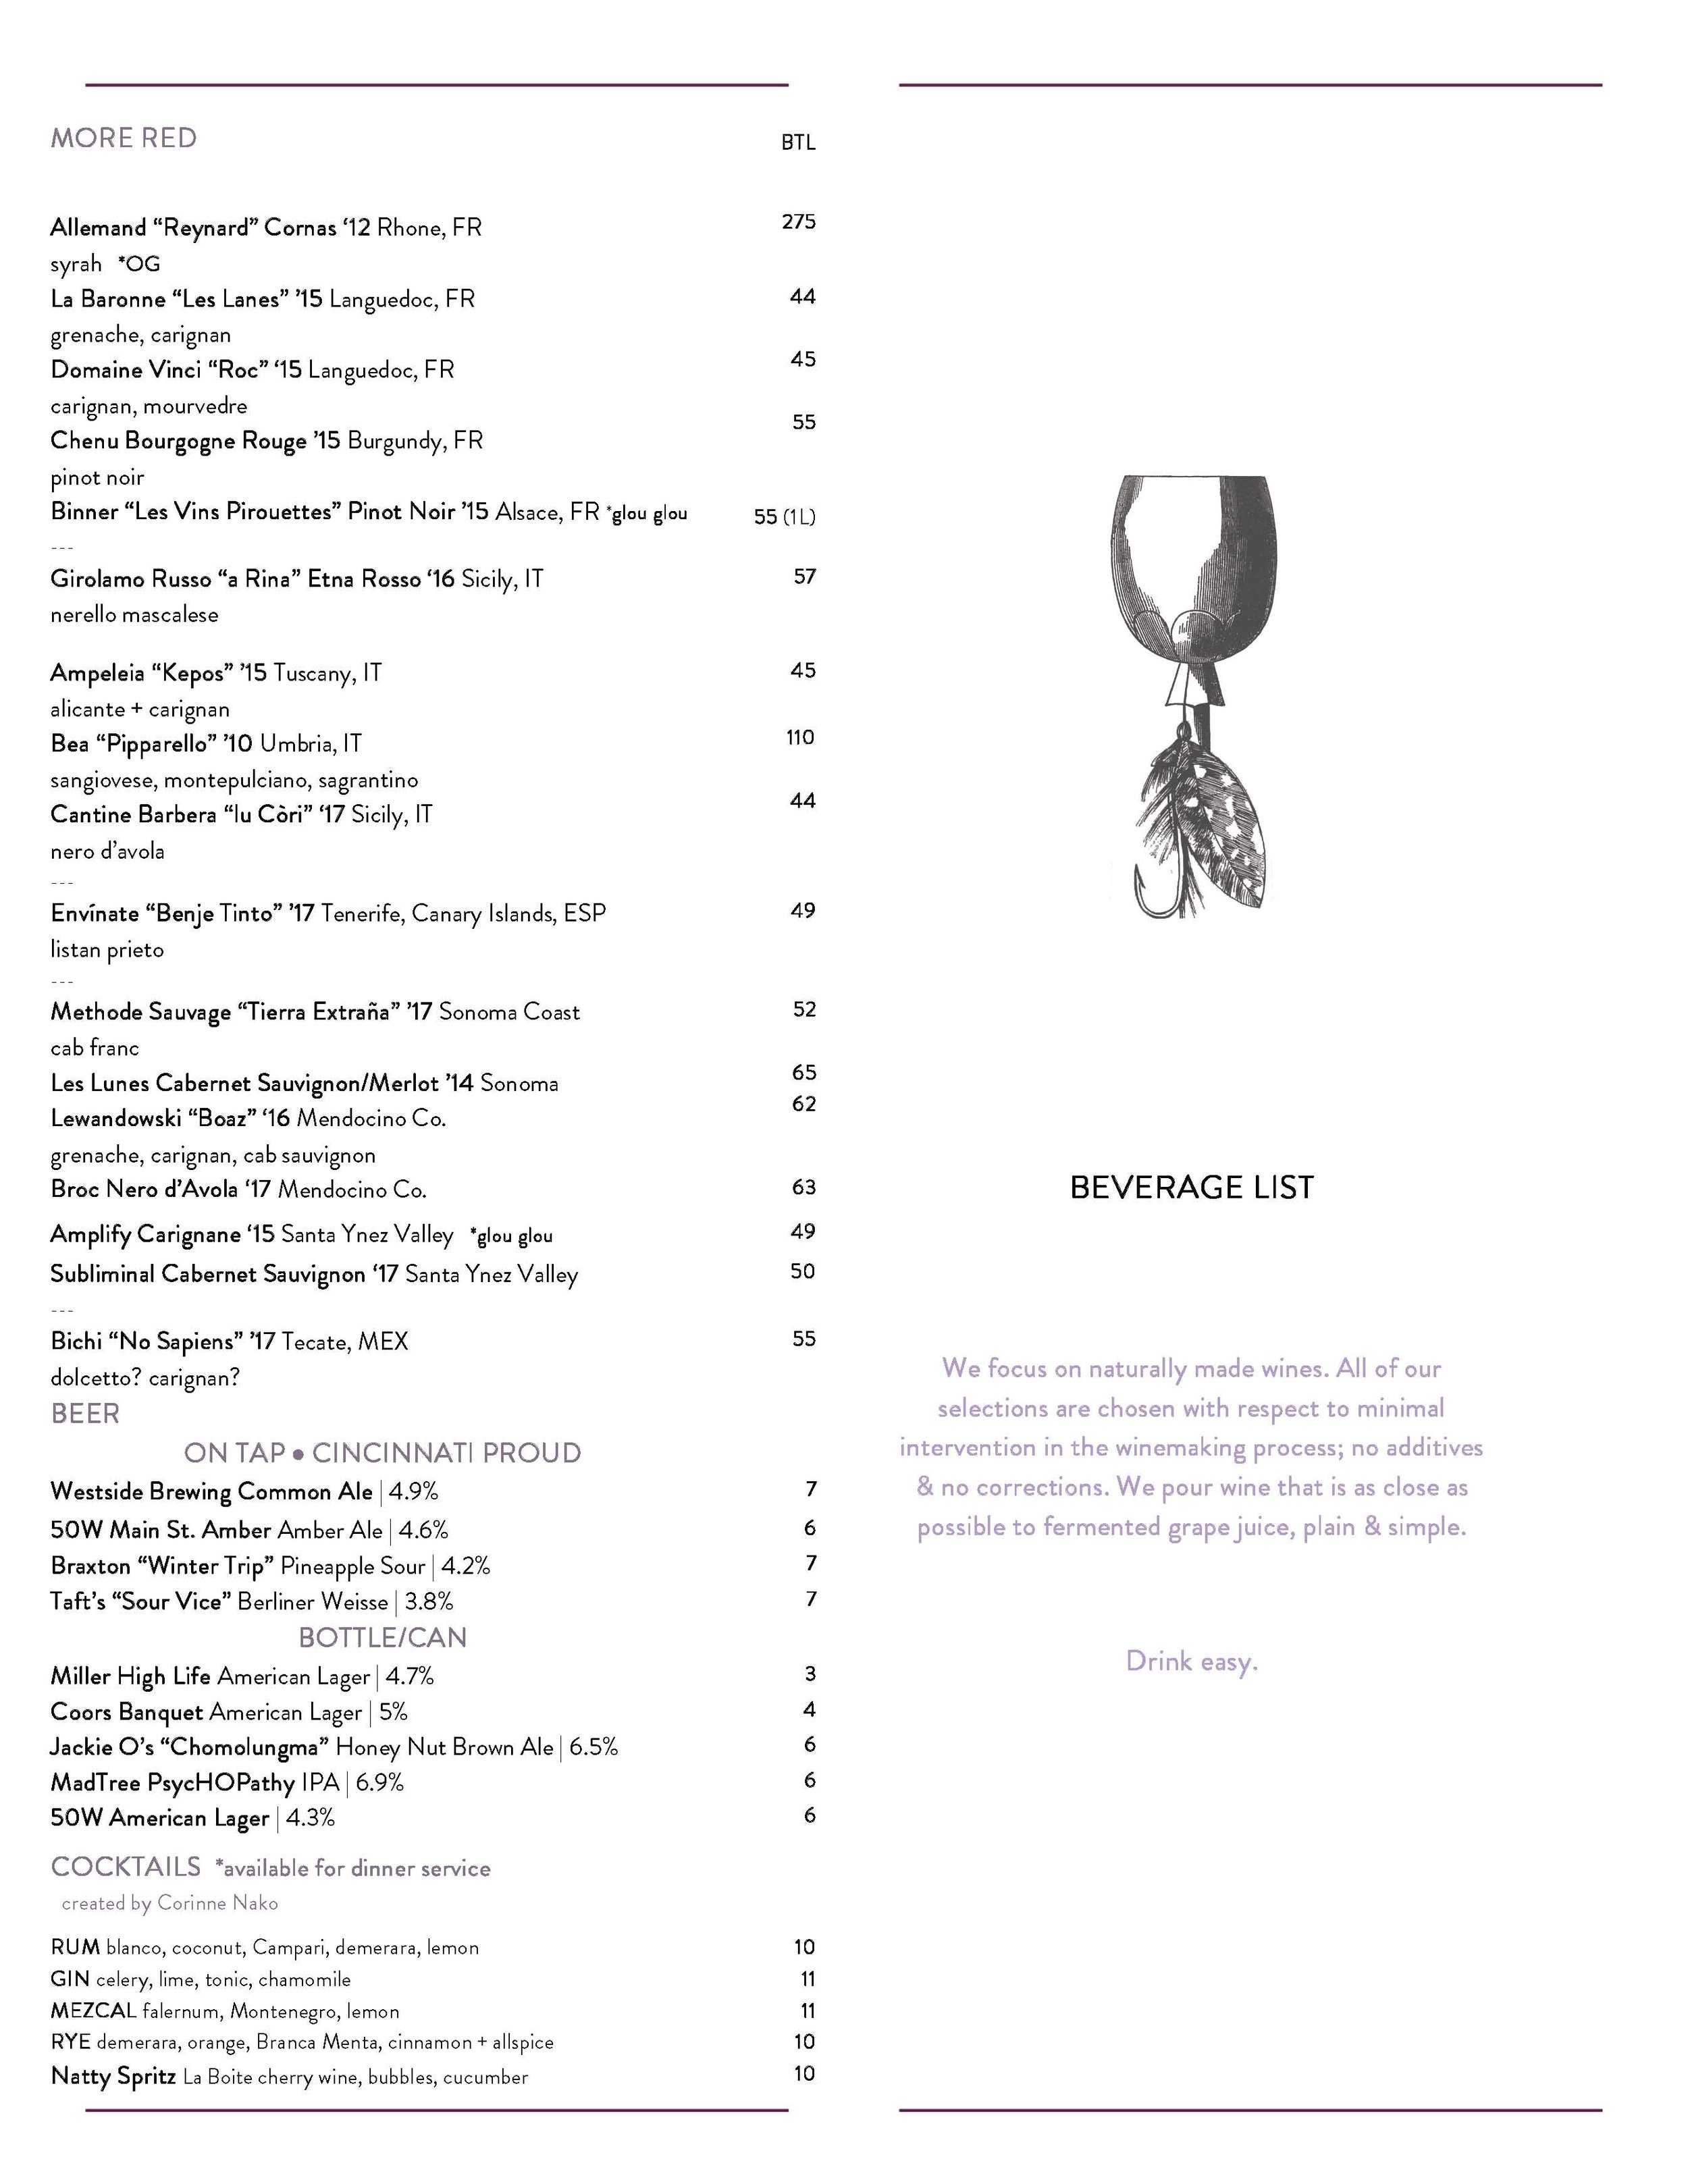 Bev List 1.20.19_Page_2.jpg